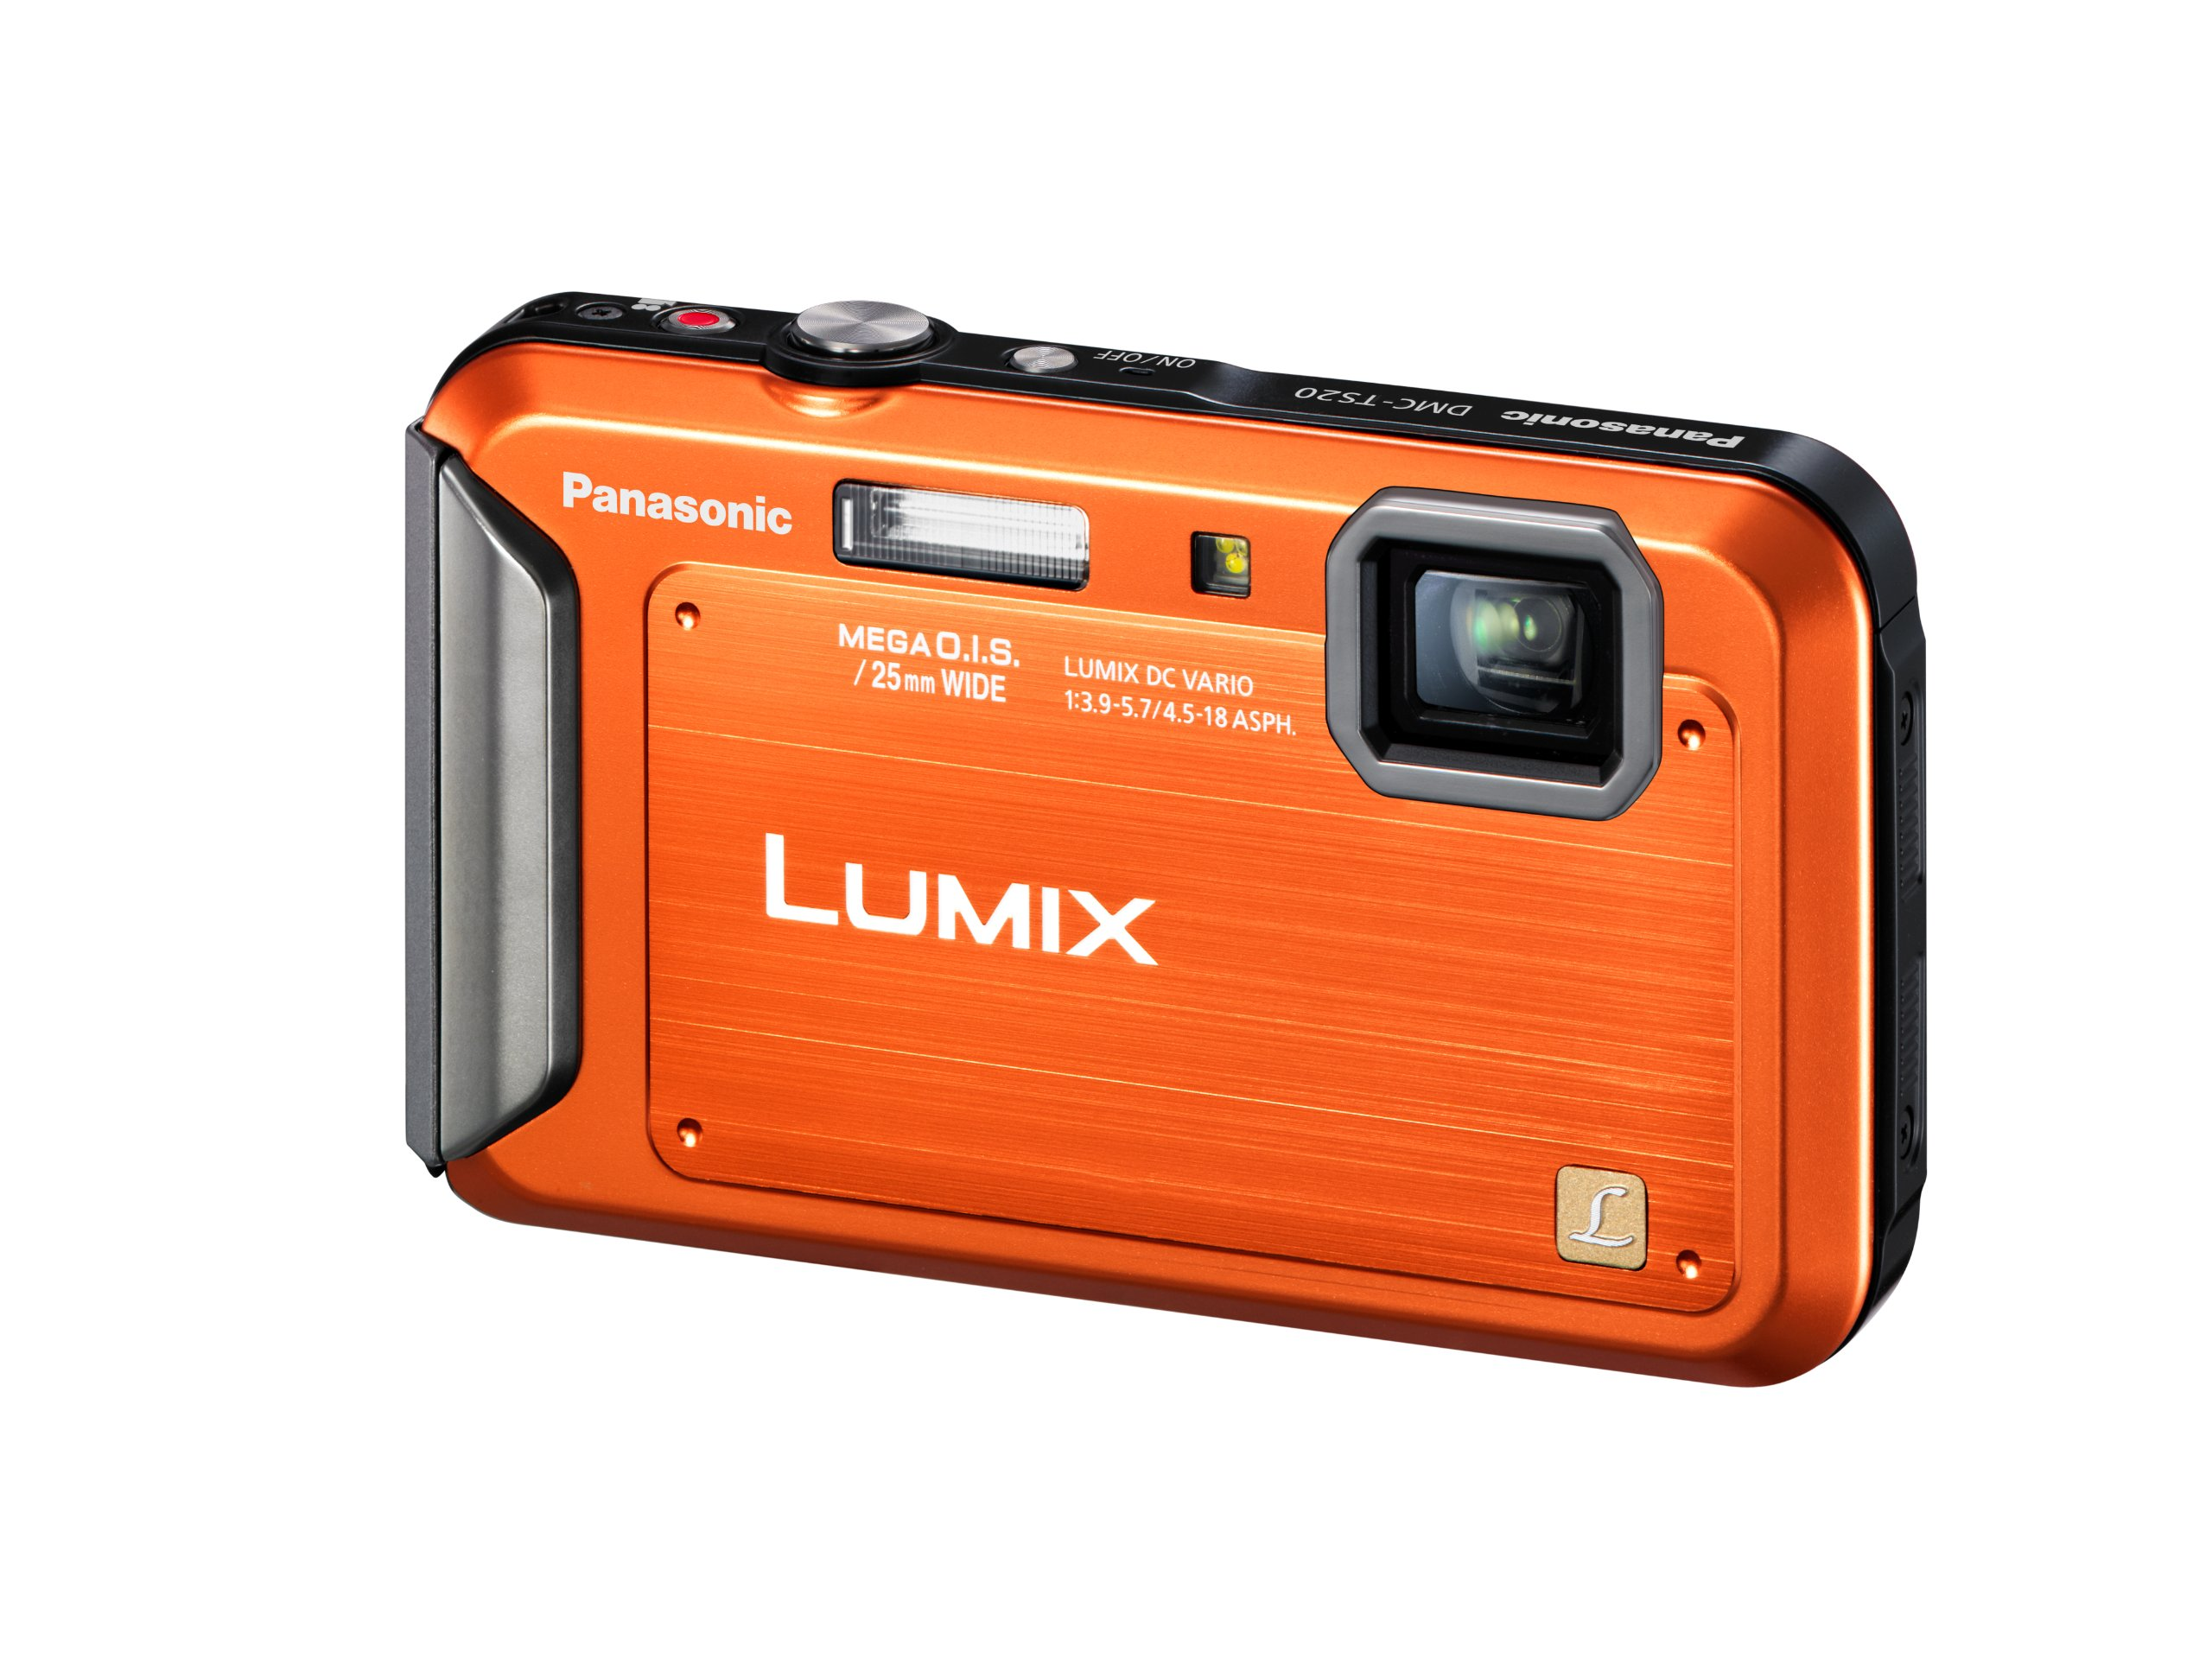 Panasonic Lumix TS20 16.1 MP TOUGH Waterproof Digital Camera with 4x Optical Zoom (Orange) (OLD MODEL) by Panasonic (Image #3)